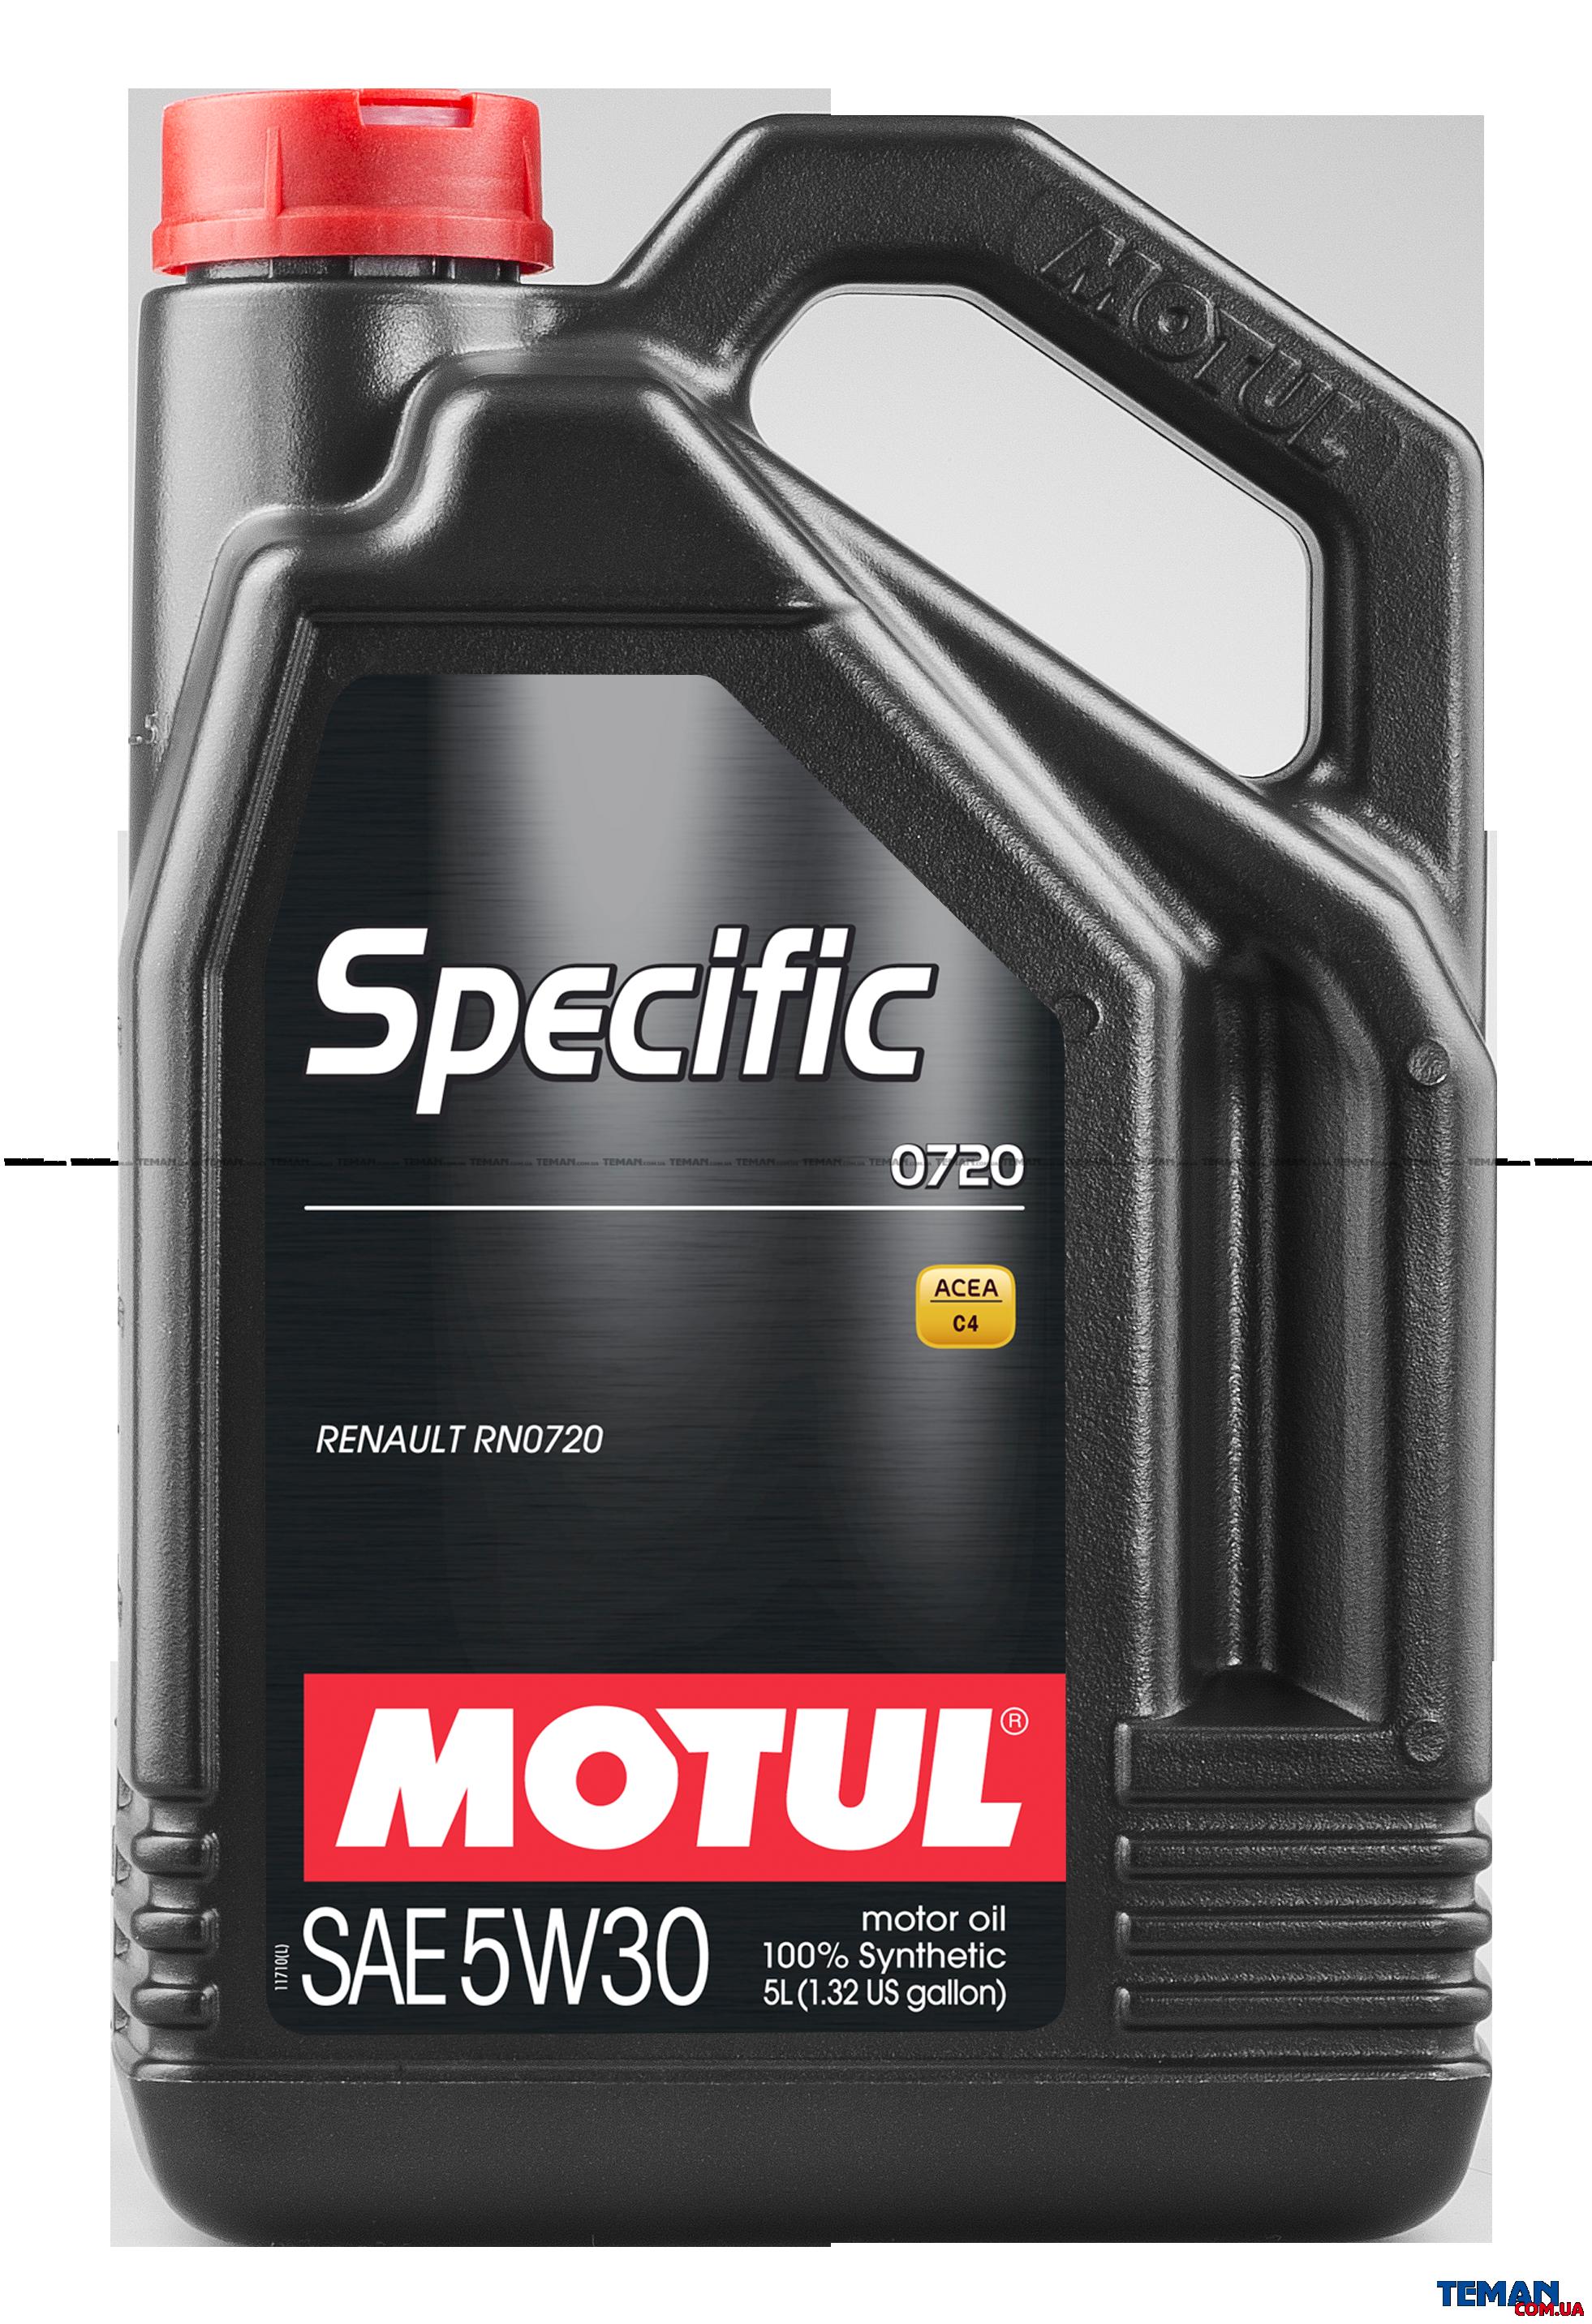 Синтетическое моторное масло SPECIFIC 0720 5W-30, 5 л